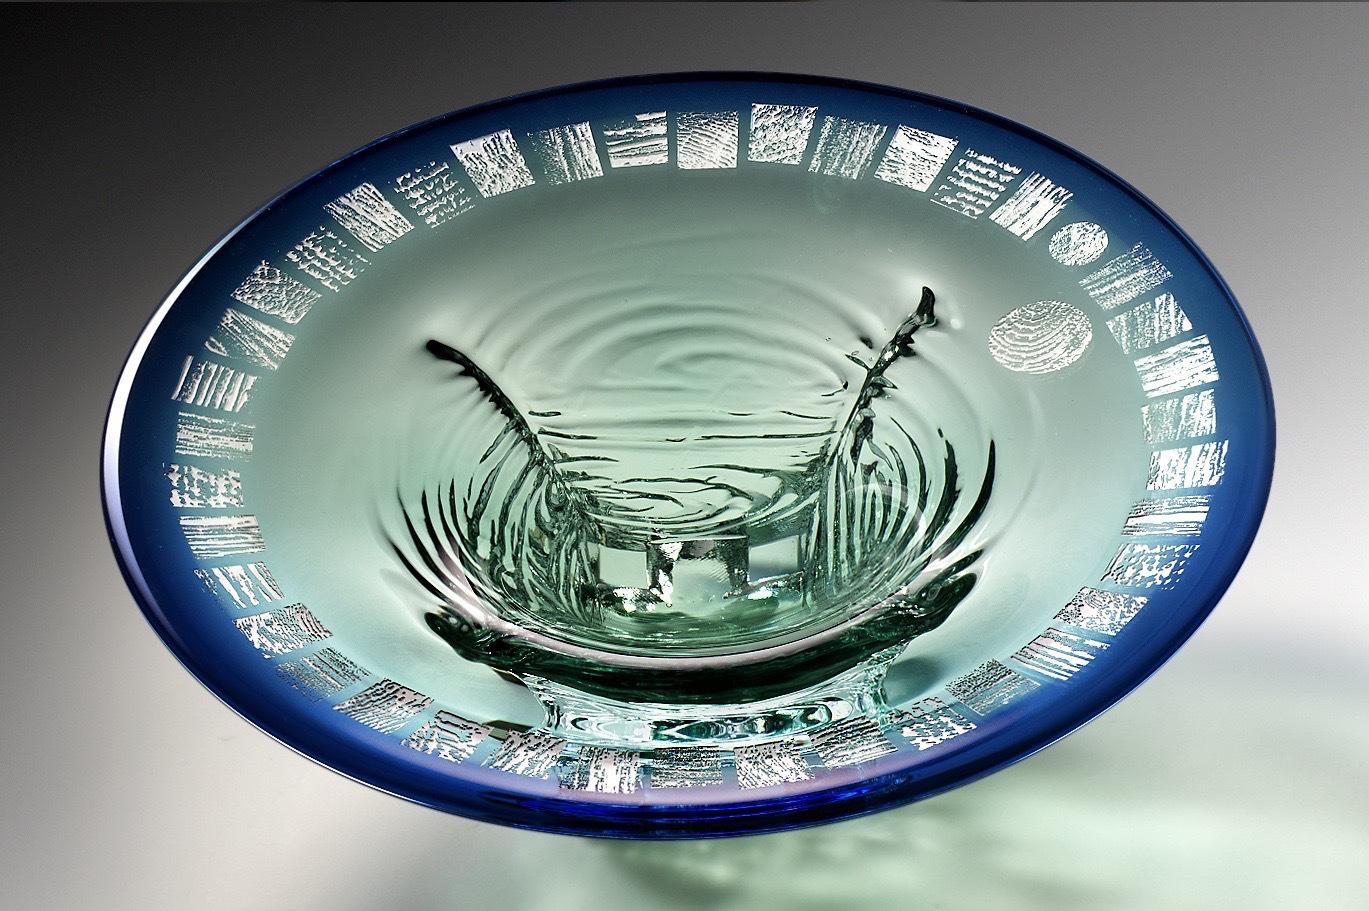 Blown Glass Fine Art, Michael Mikula, Cleveland, OH-019.jpg